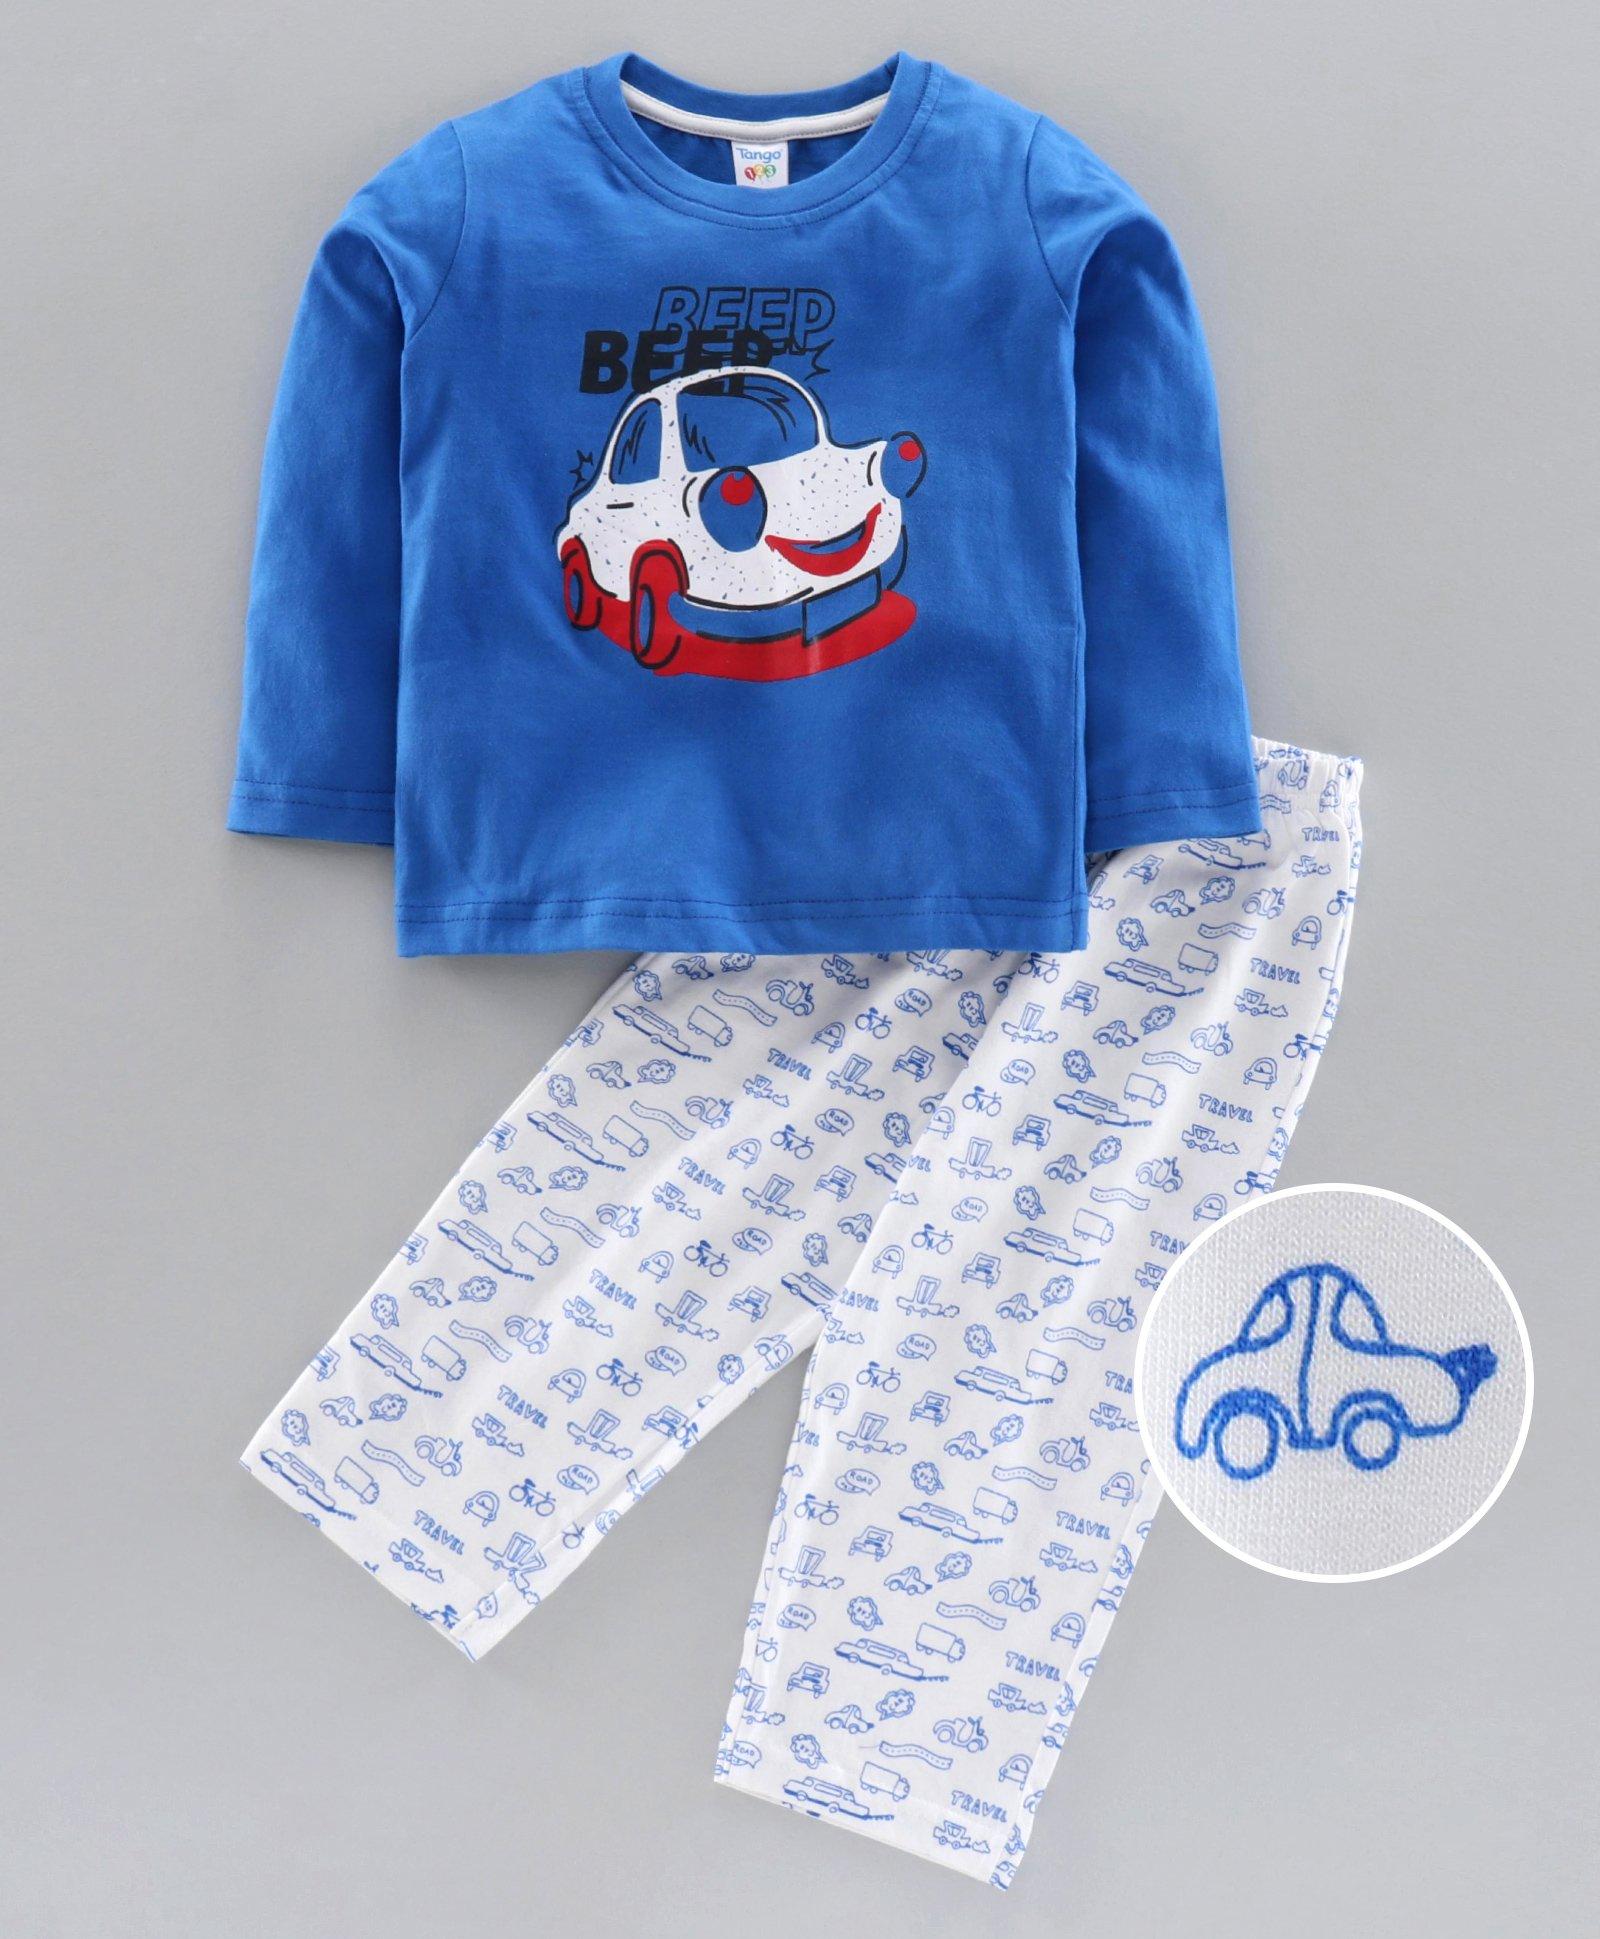 Baby Boys Colourful Cars Beep Beep Cotton Socks 6-12 Months, Red Beep Beep